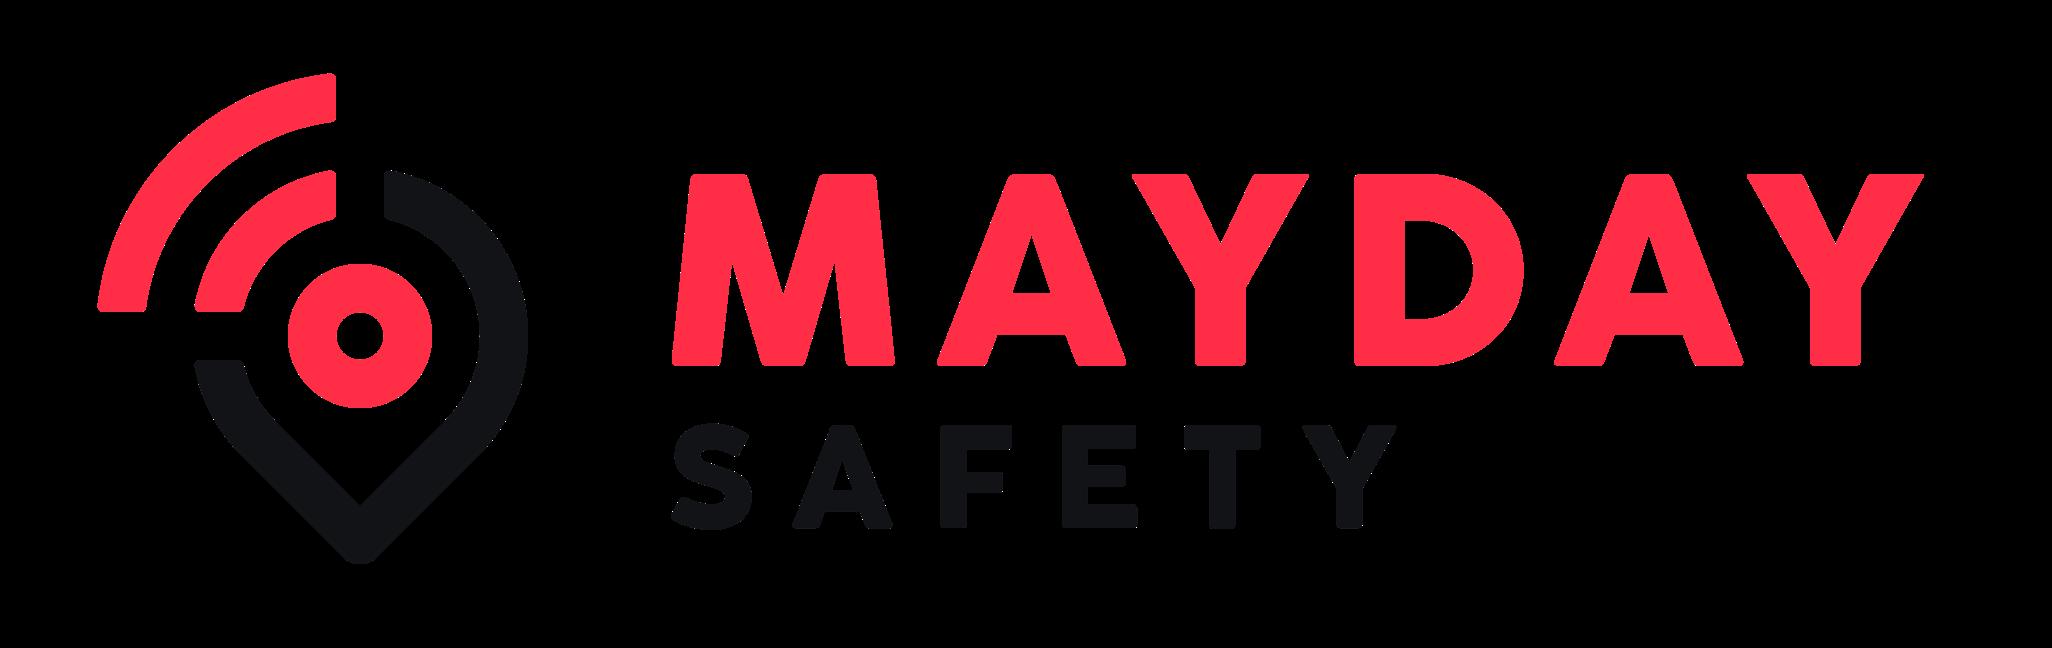 Mayday_Logo_Hor_RB-2.png